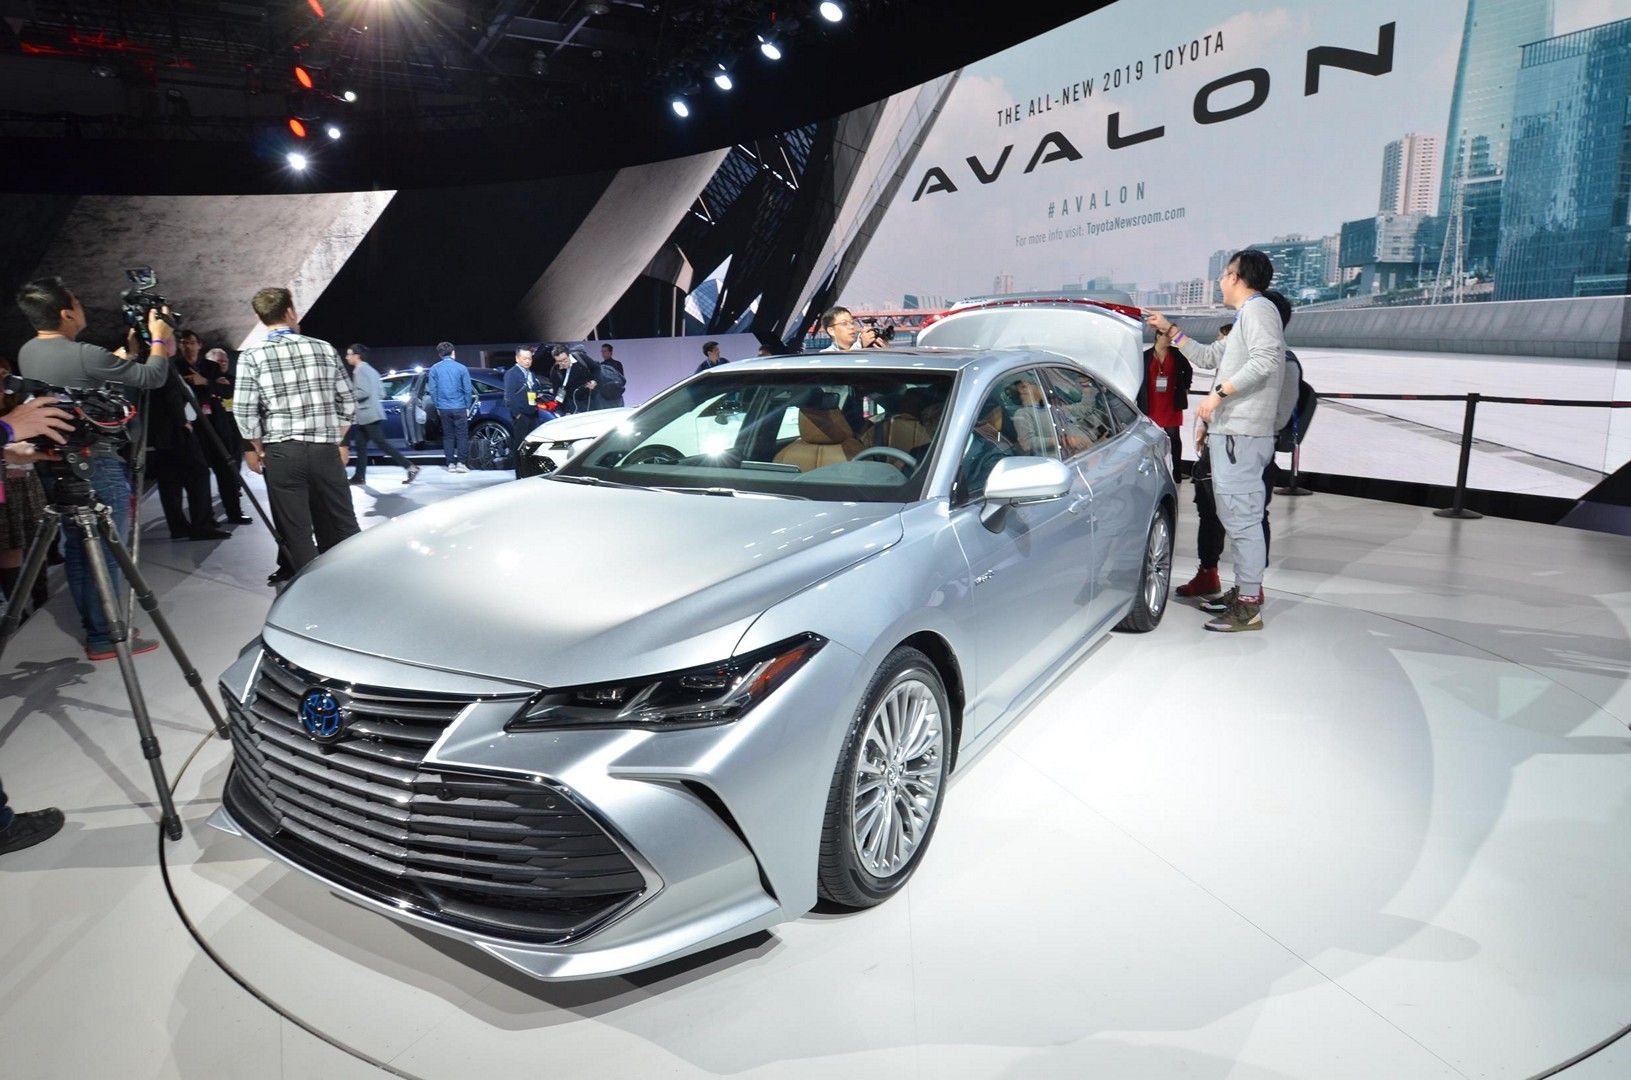 2019 Toyota Avalon Looks Sufficiently Japanese - autoevolution